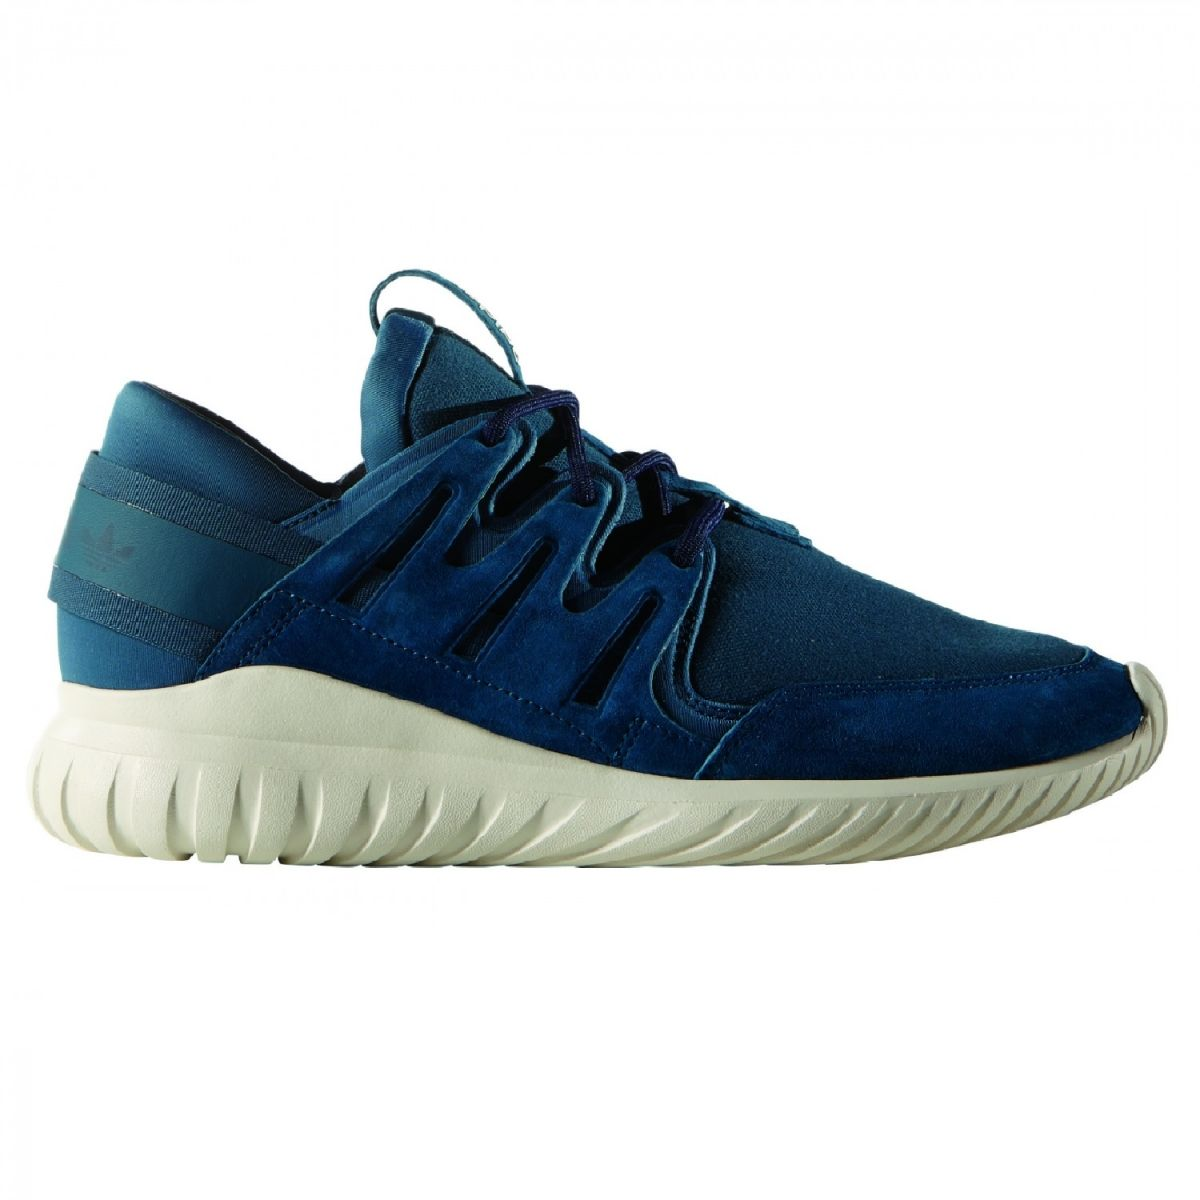 adidas originals tubular nova herren sneaker blau s74824 sport klingenmaier. Black Bedroom Furniture Sets. Home Design Ideas